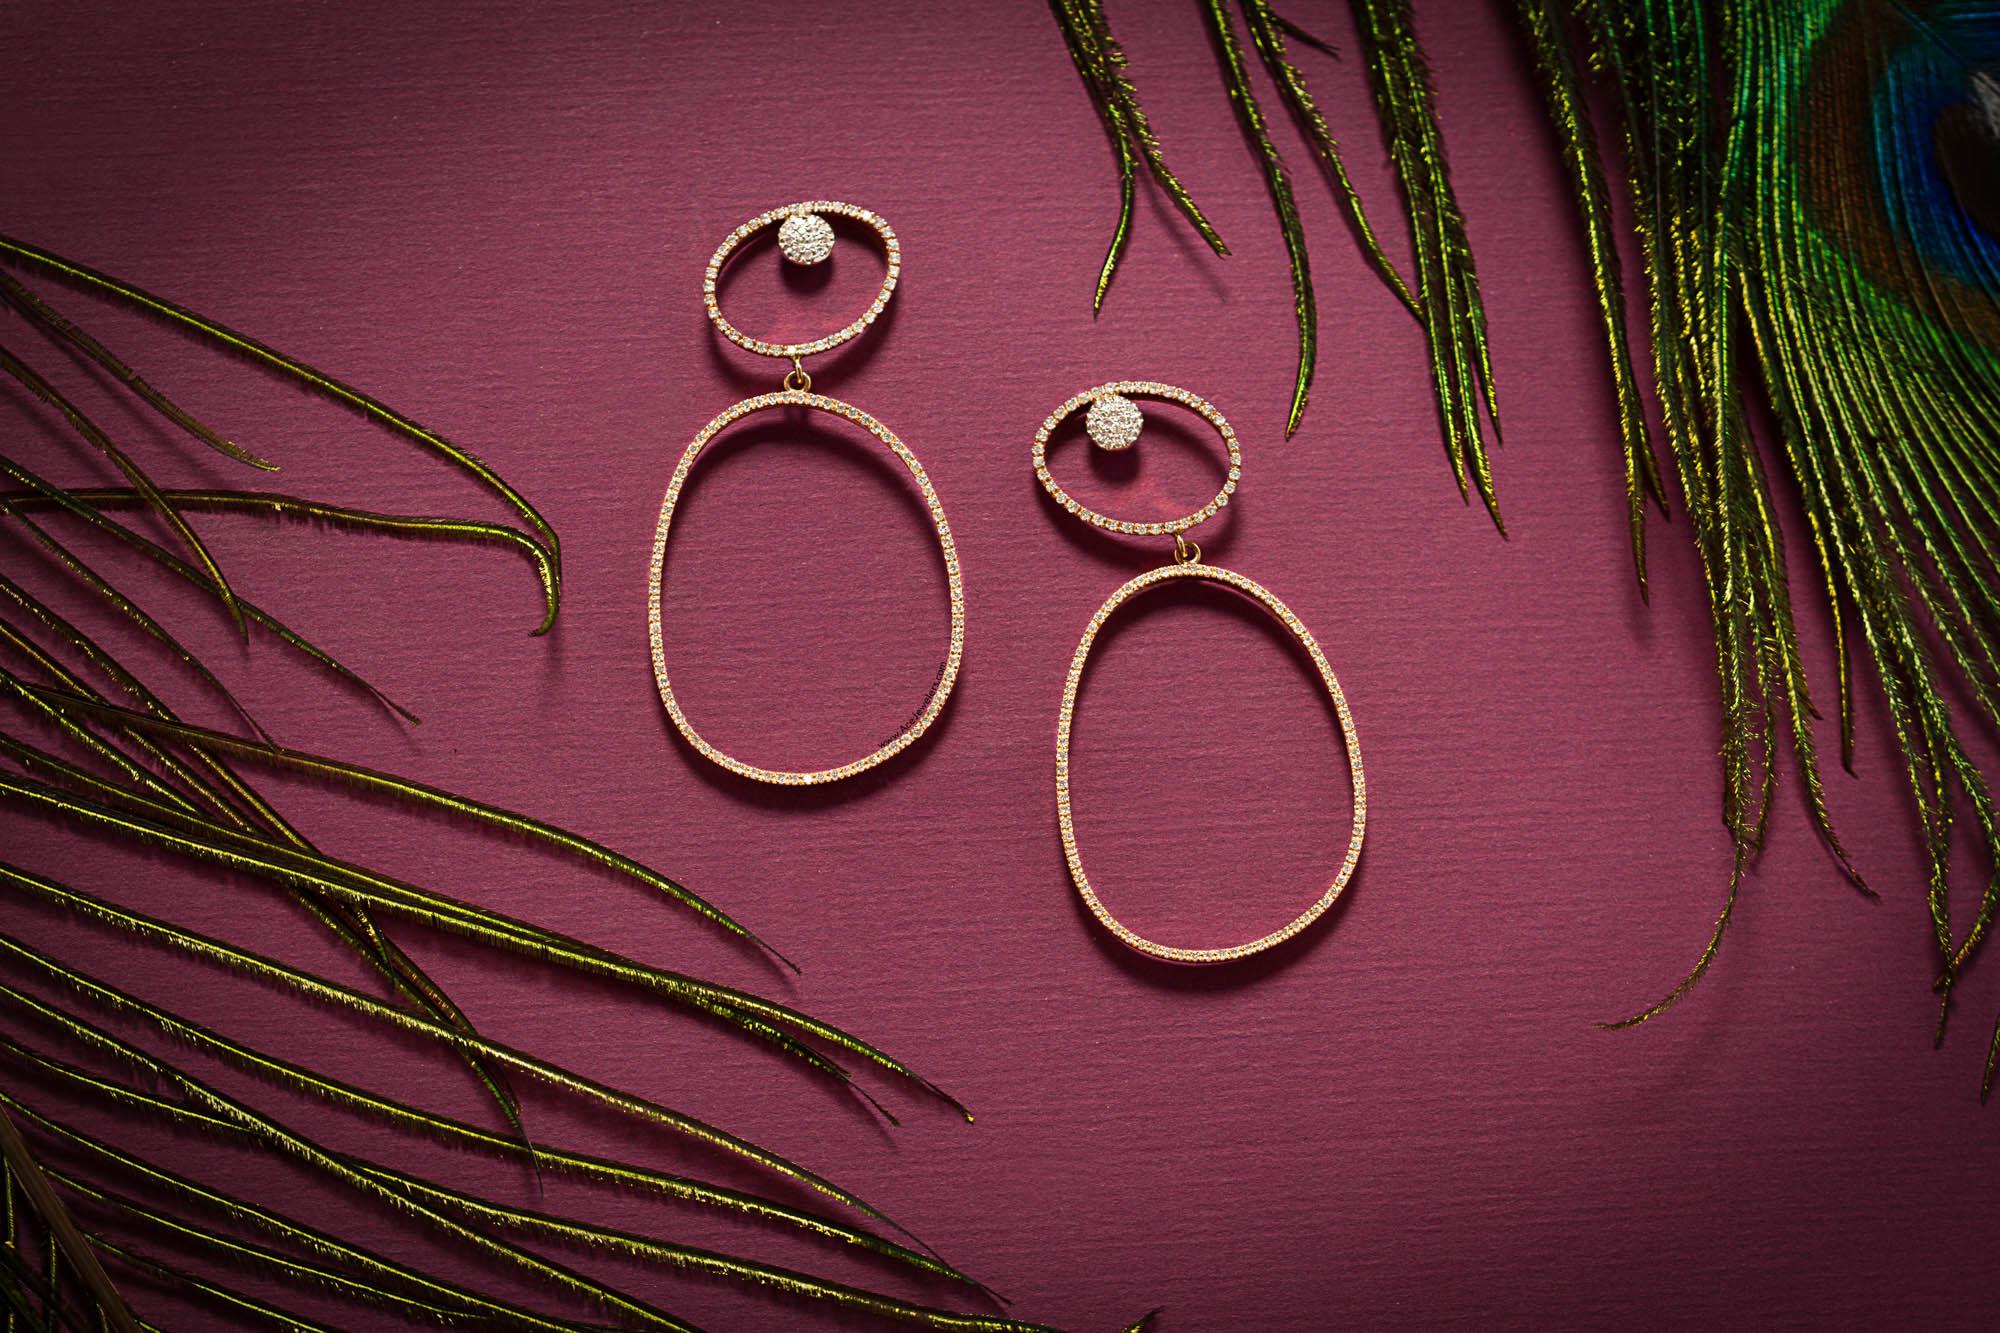 zoccai-diamond-earrings-ace-jewelers-amsterdam-1-1